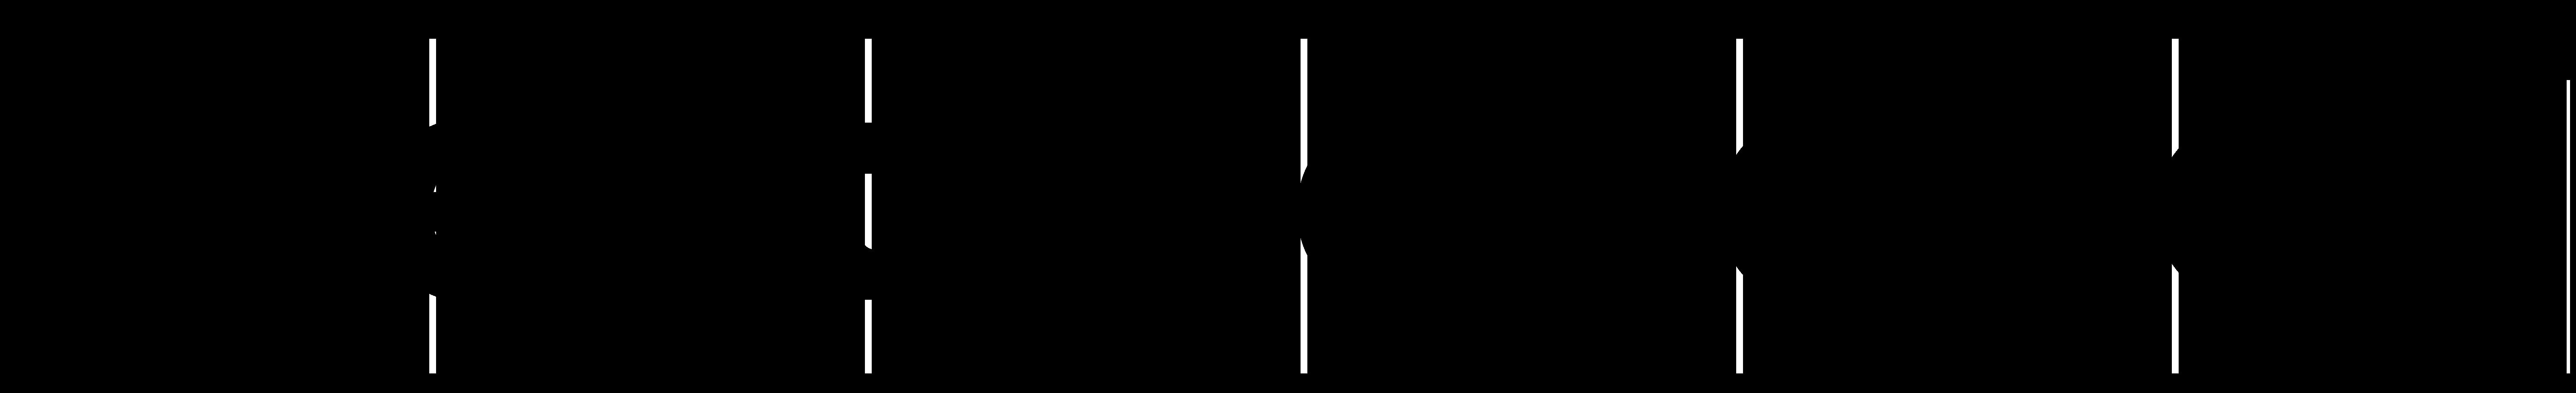 1 12 2020 6 00 pm